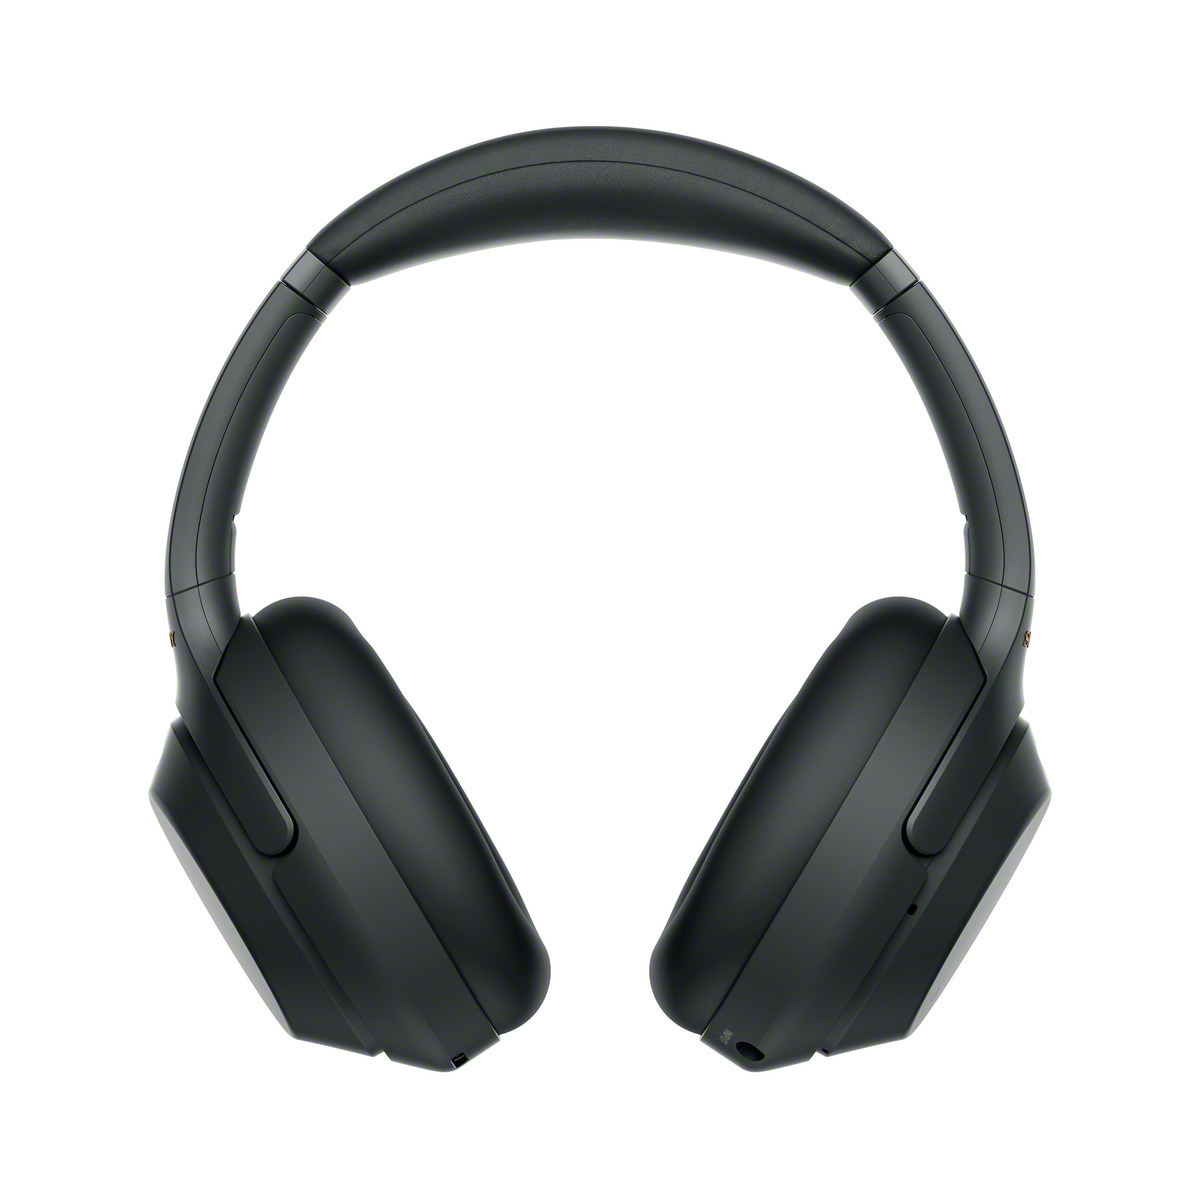 Sony WH-1000mx3.jpg